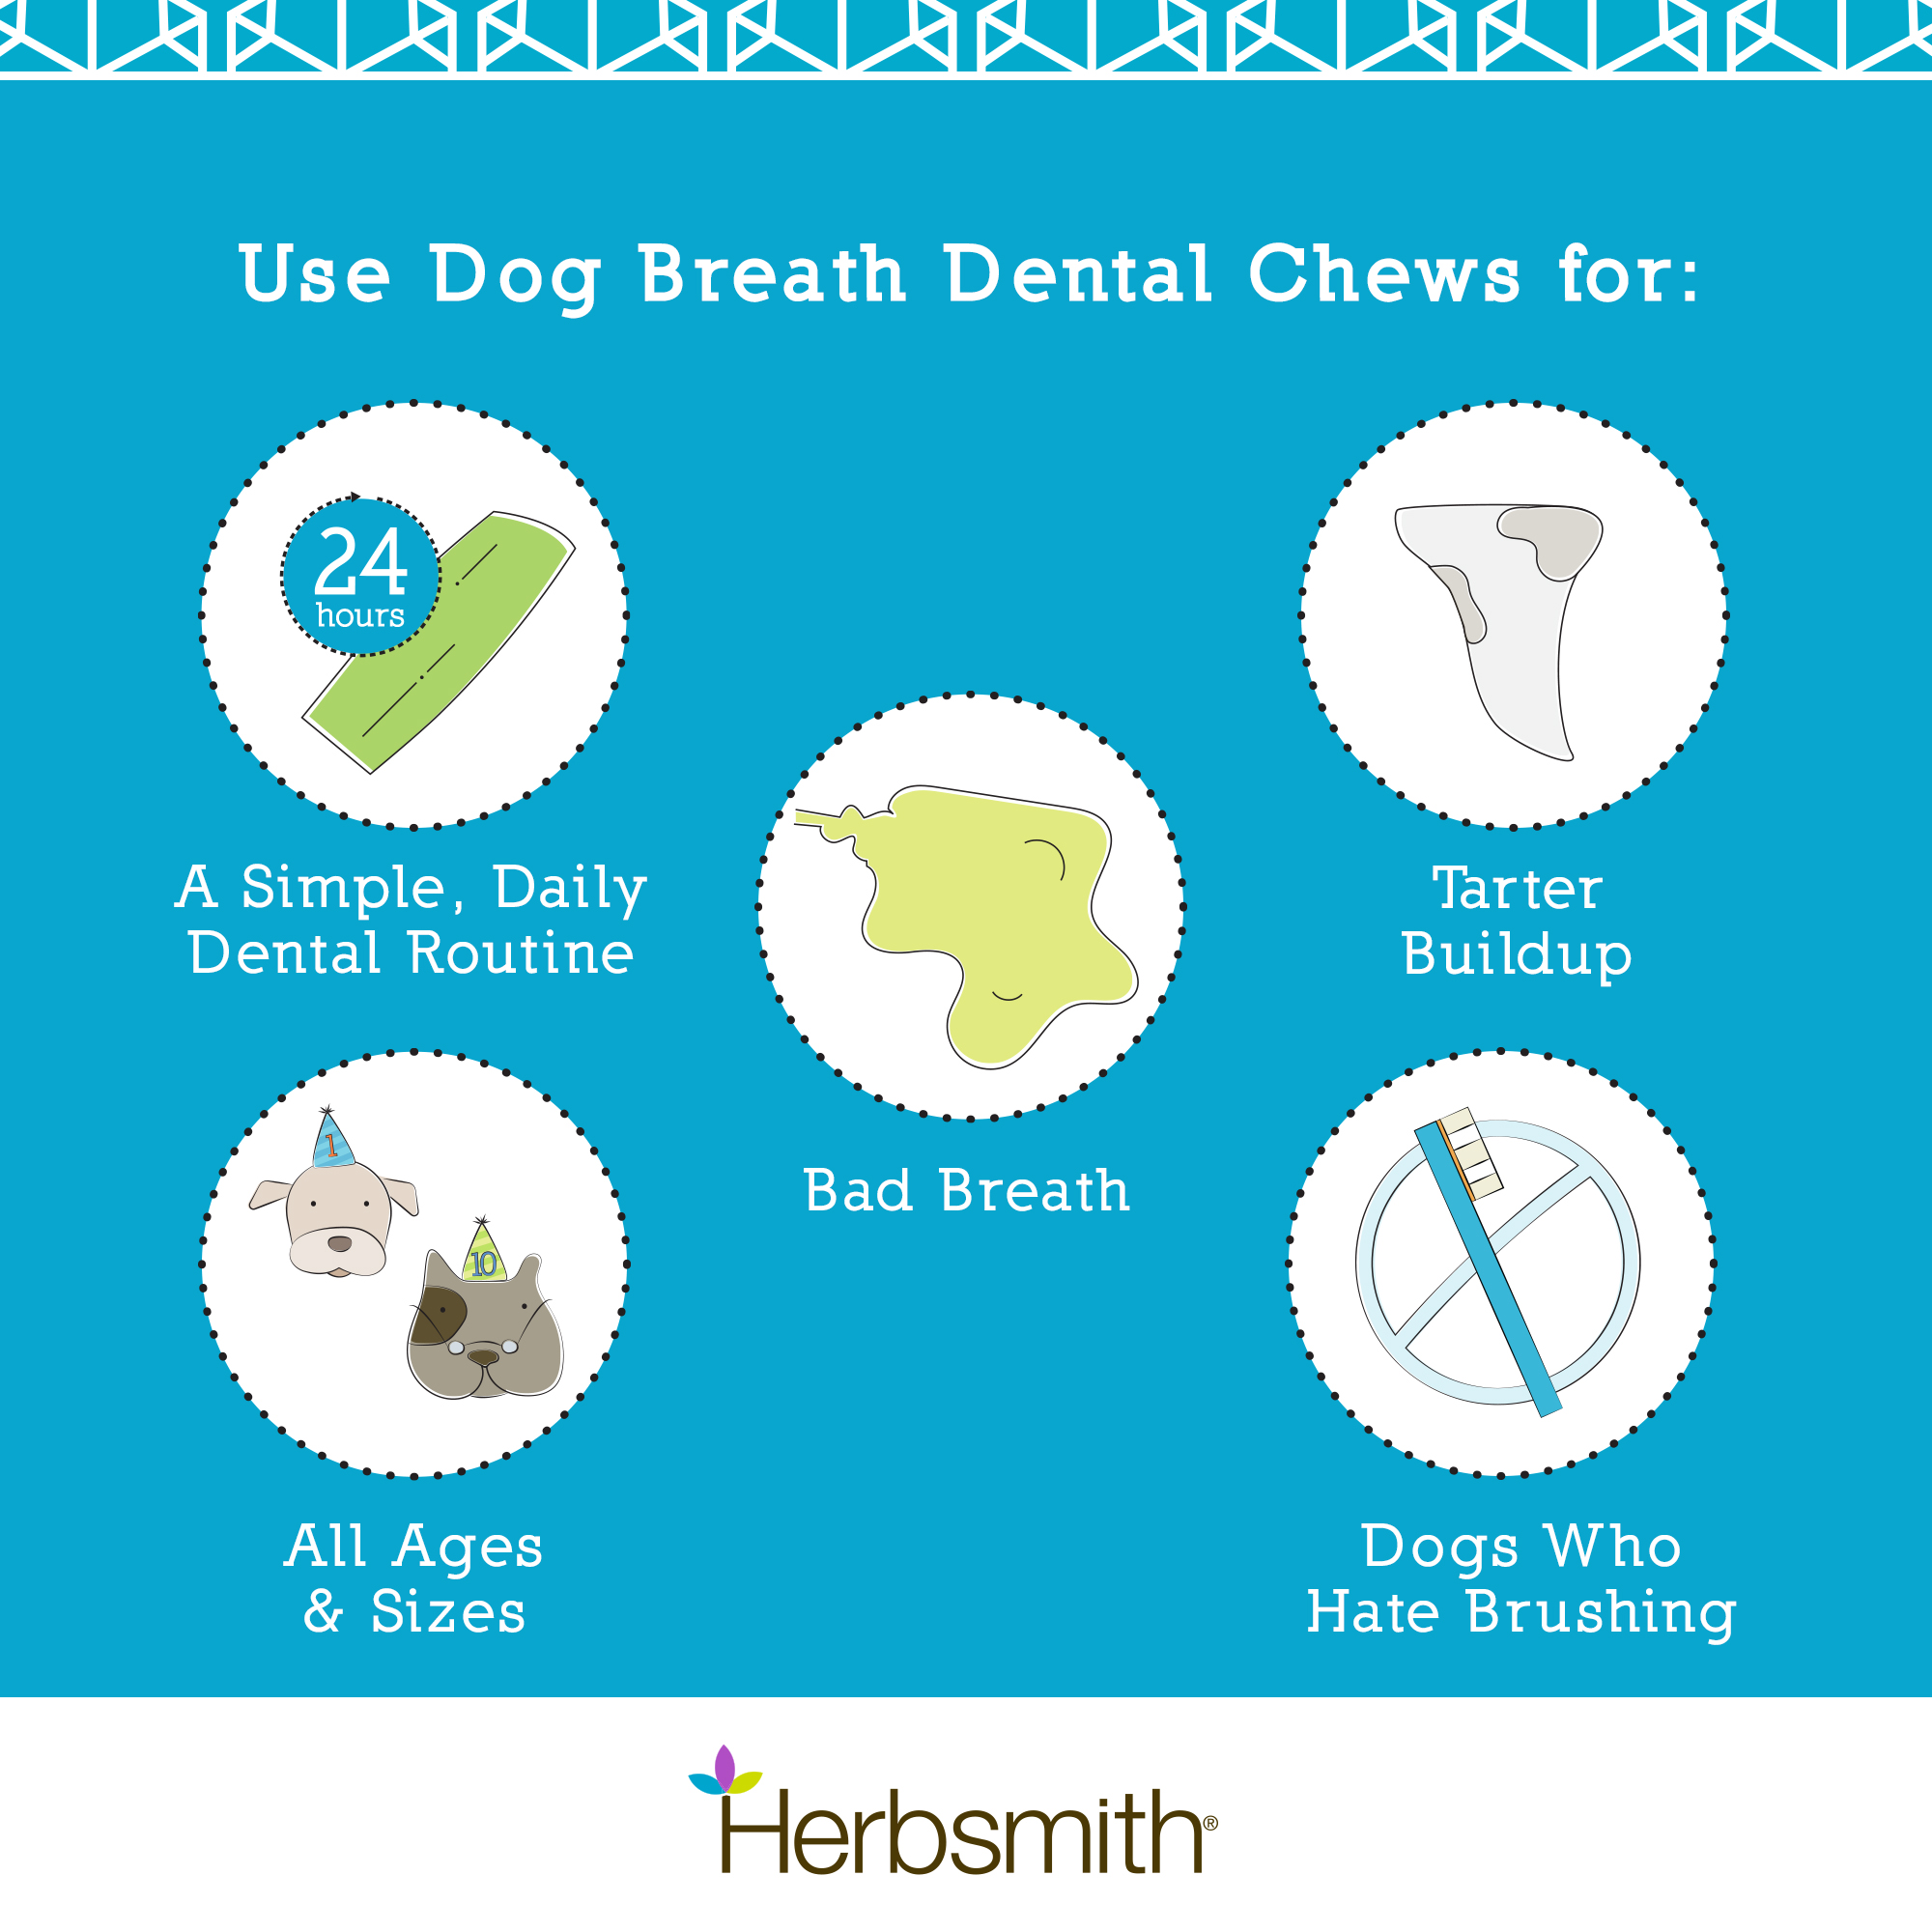 herbsmith-amazon-art-files-dog-breath-Final-usage